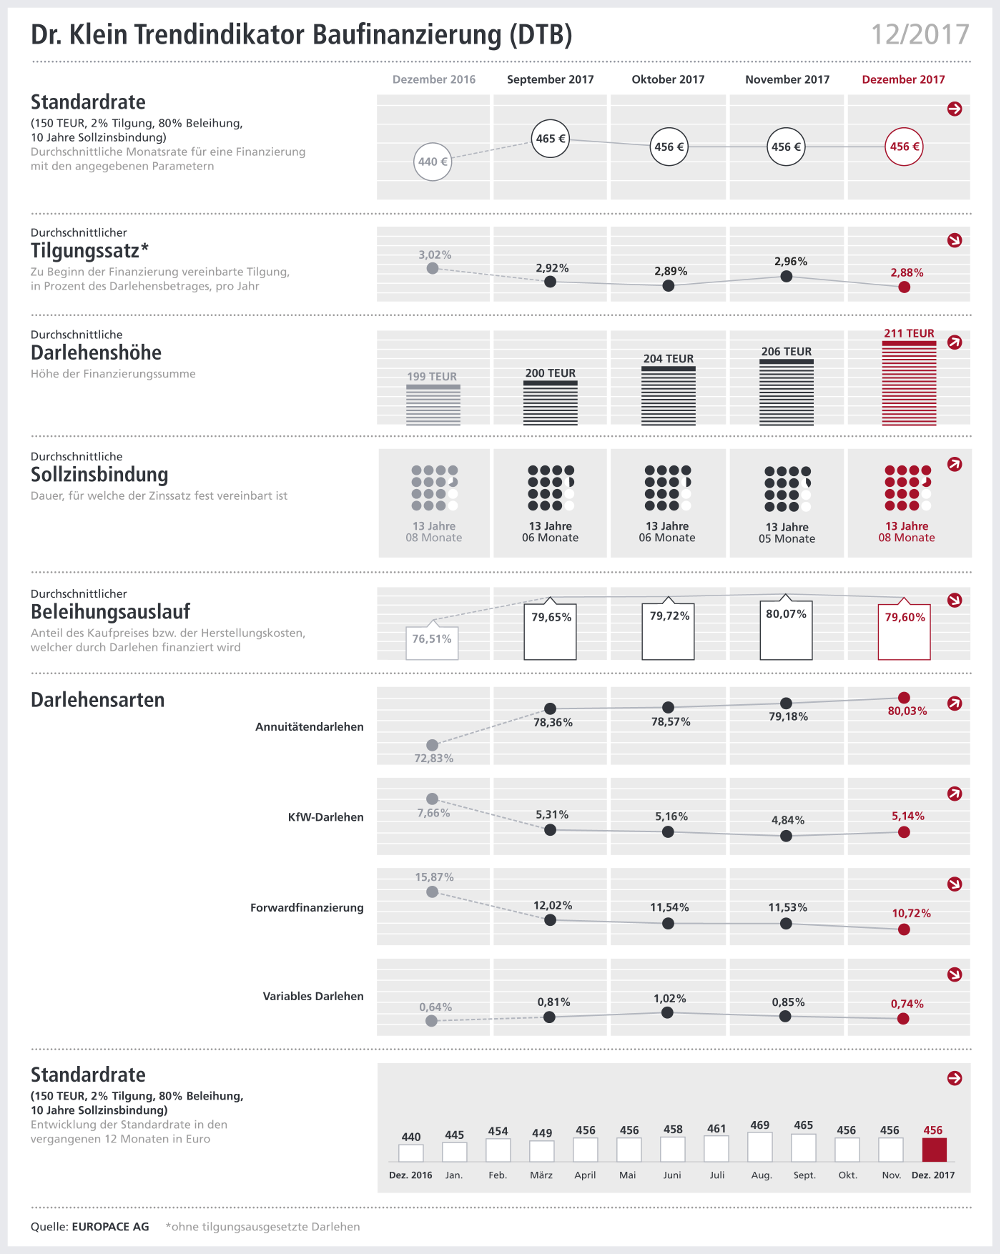 Diverse Grafiken zu den Entwicklungen der Baufinanzierungen Dezember 2017